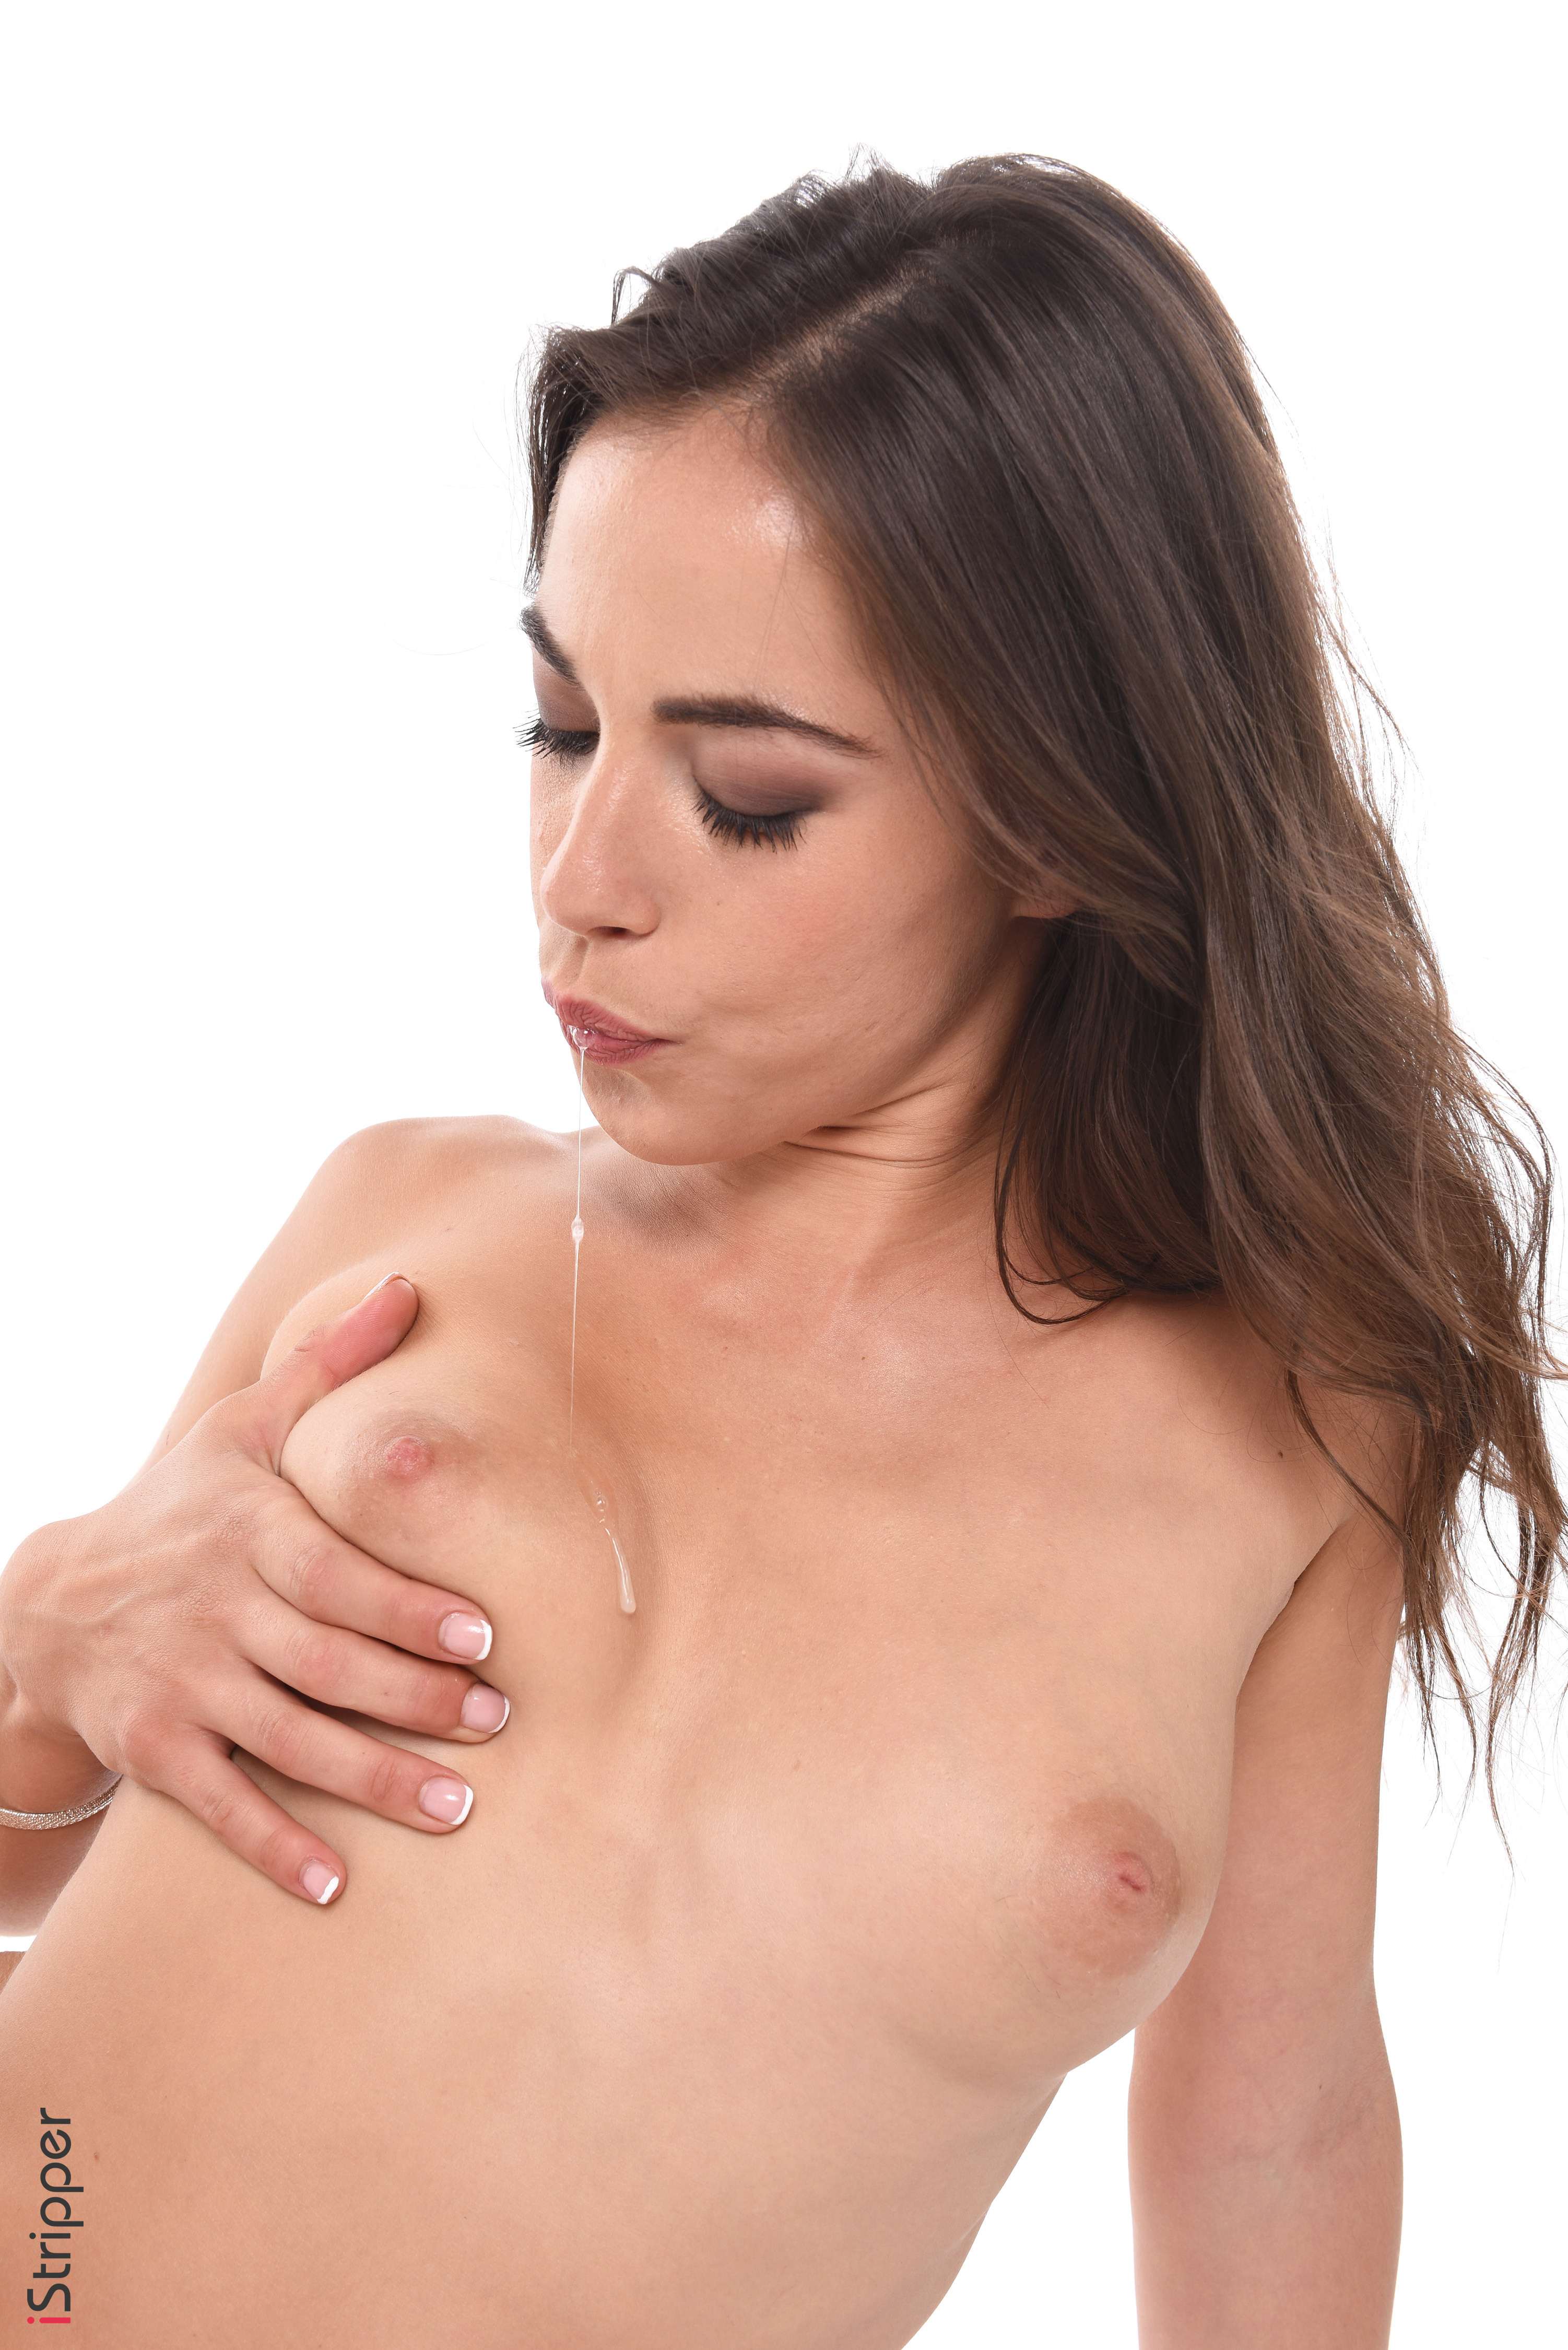 hd wallpapers topless lana del rey hd nude